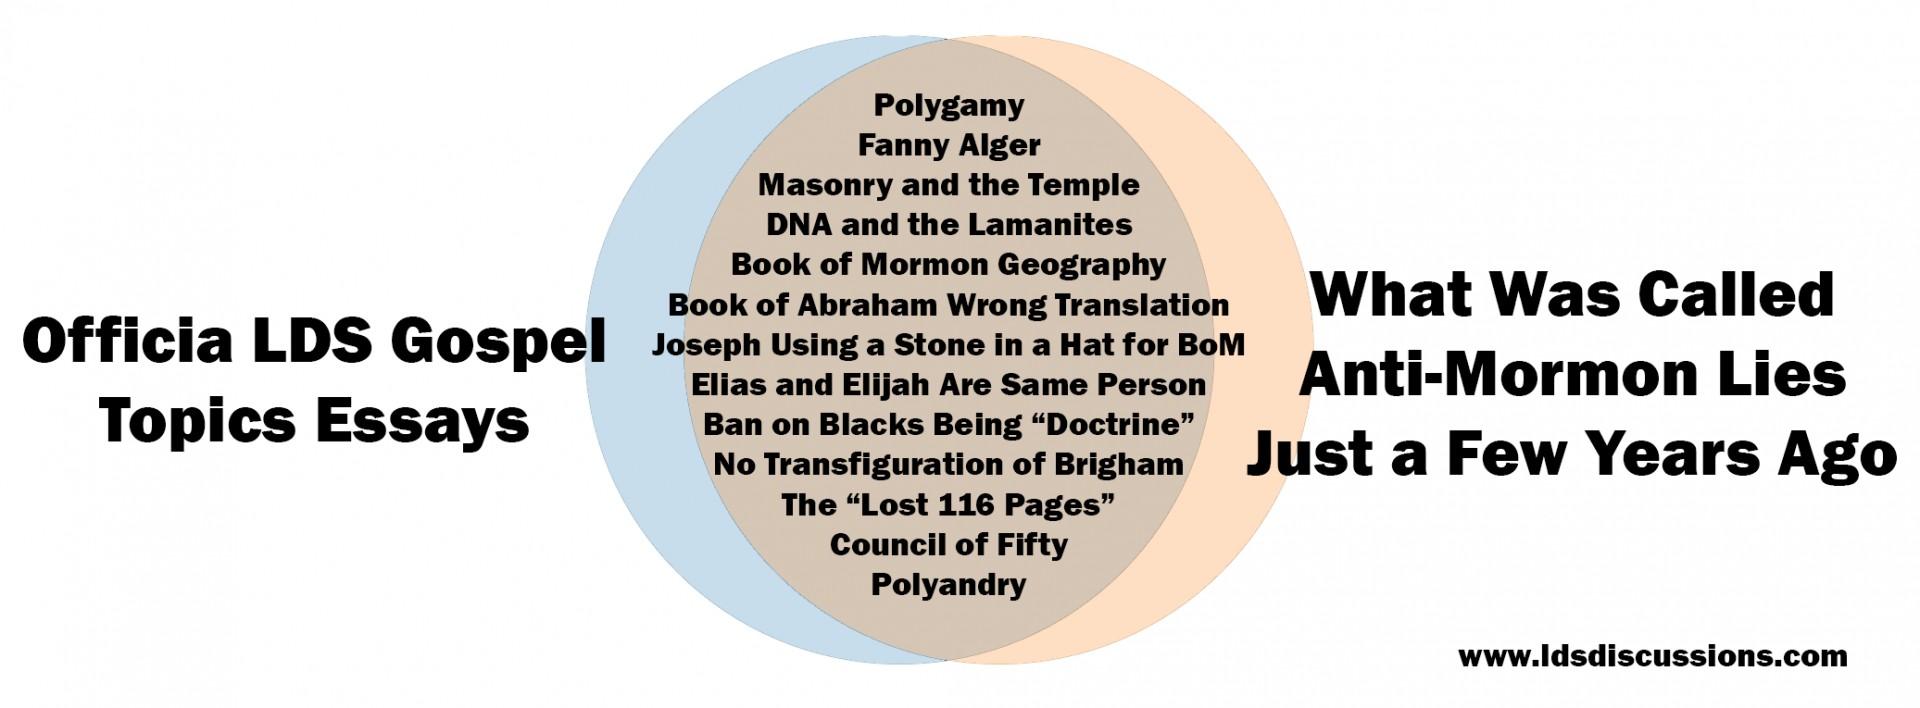 010 Gospel Topics Essays 4hmami6g86f21 Essay Outstanding Pdf Plural Marriage Becoming Like God 1920